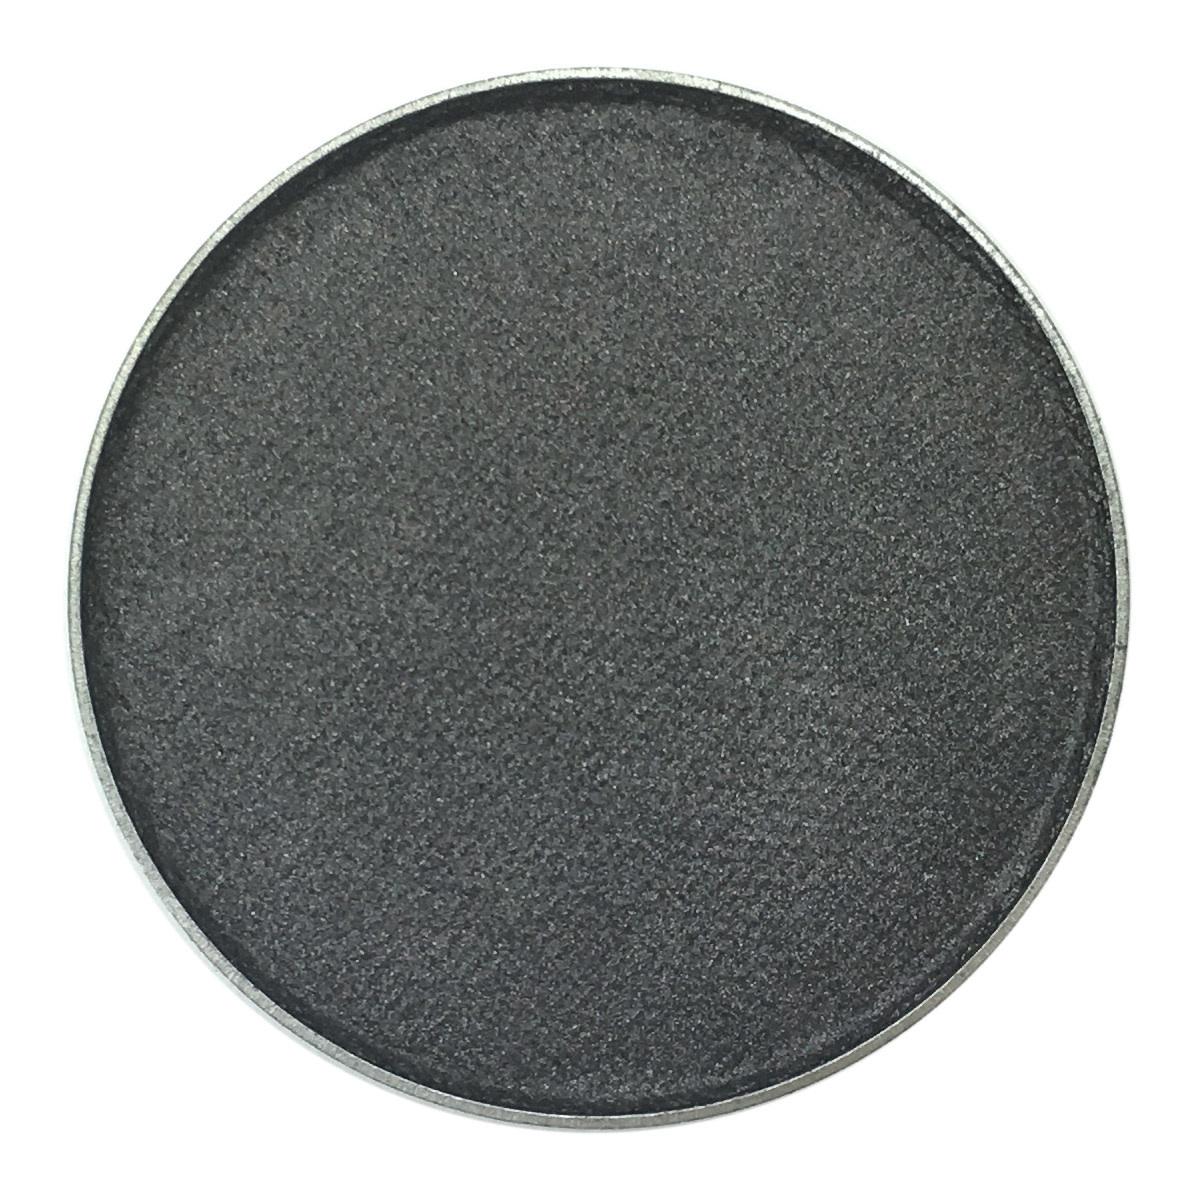 Onyx Pressed Eye-1